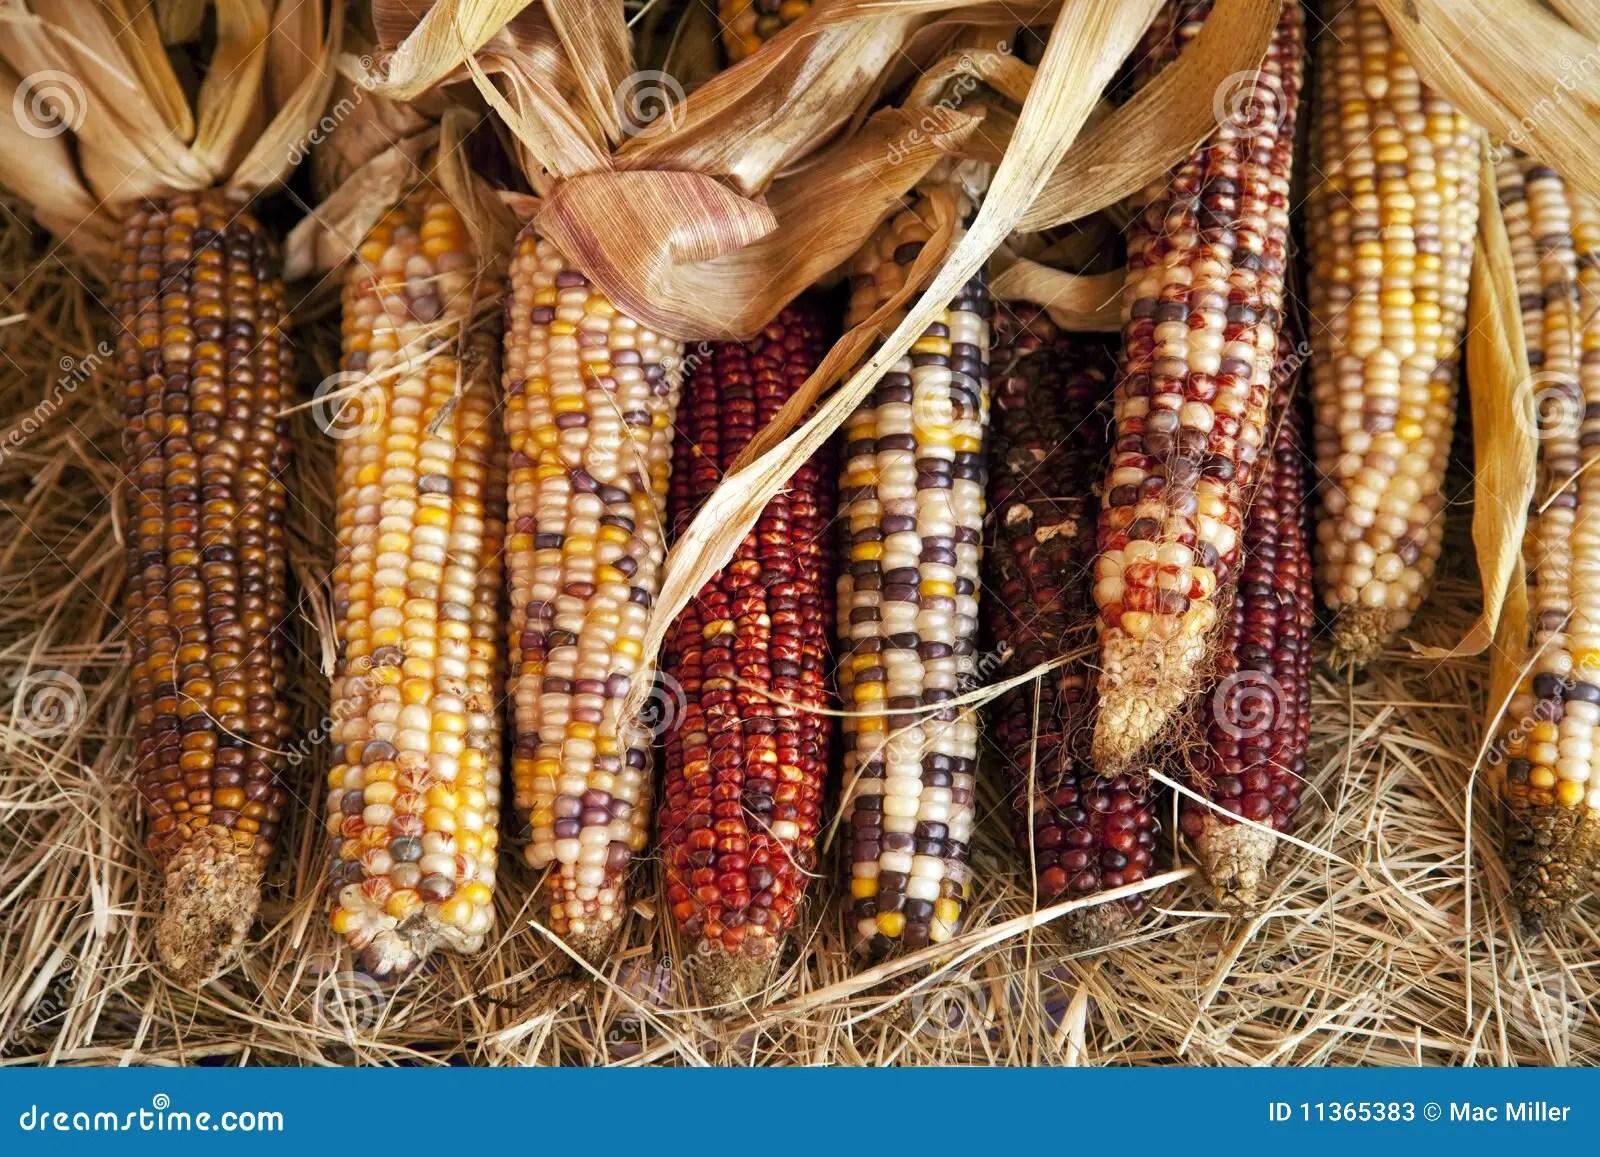 Thanksgiving Halloween Ears Of Corn Stock Image